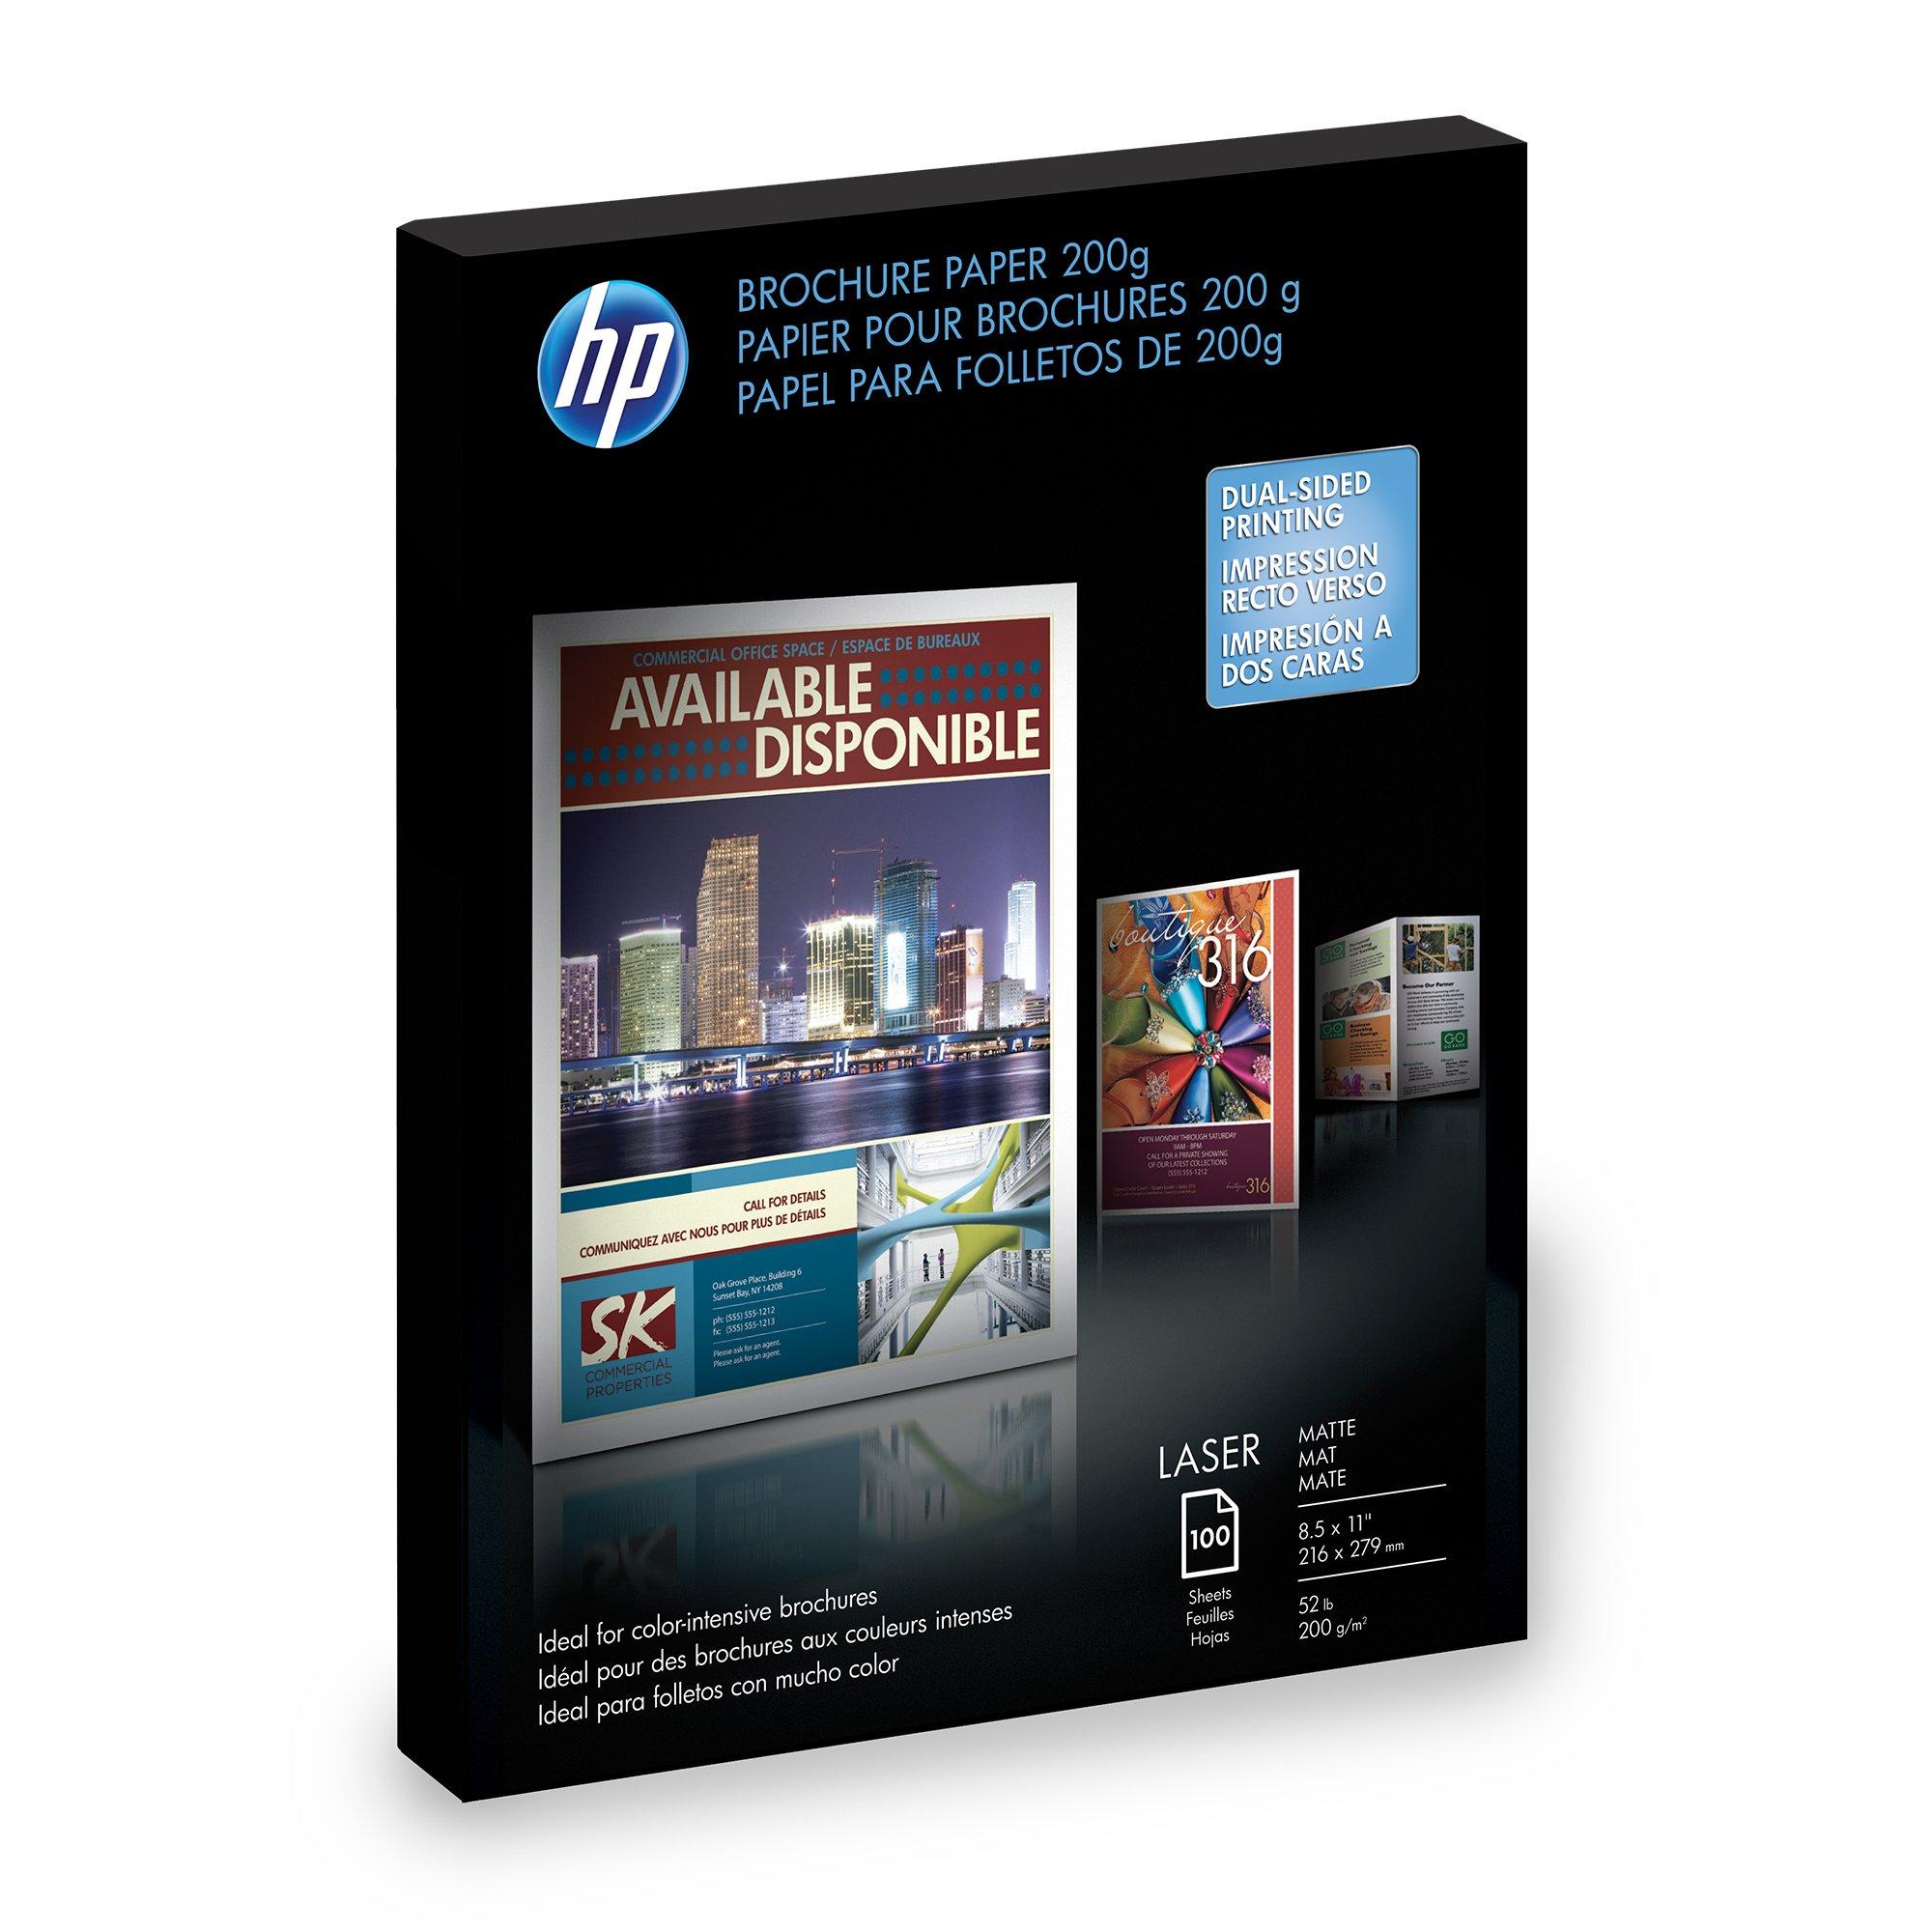 HP Q8824A Brochure Paper for Laser Printer, Matte, 8.5x11, 100 Sheets